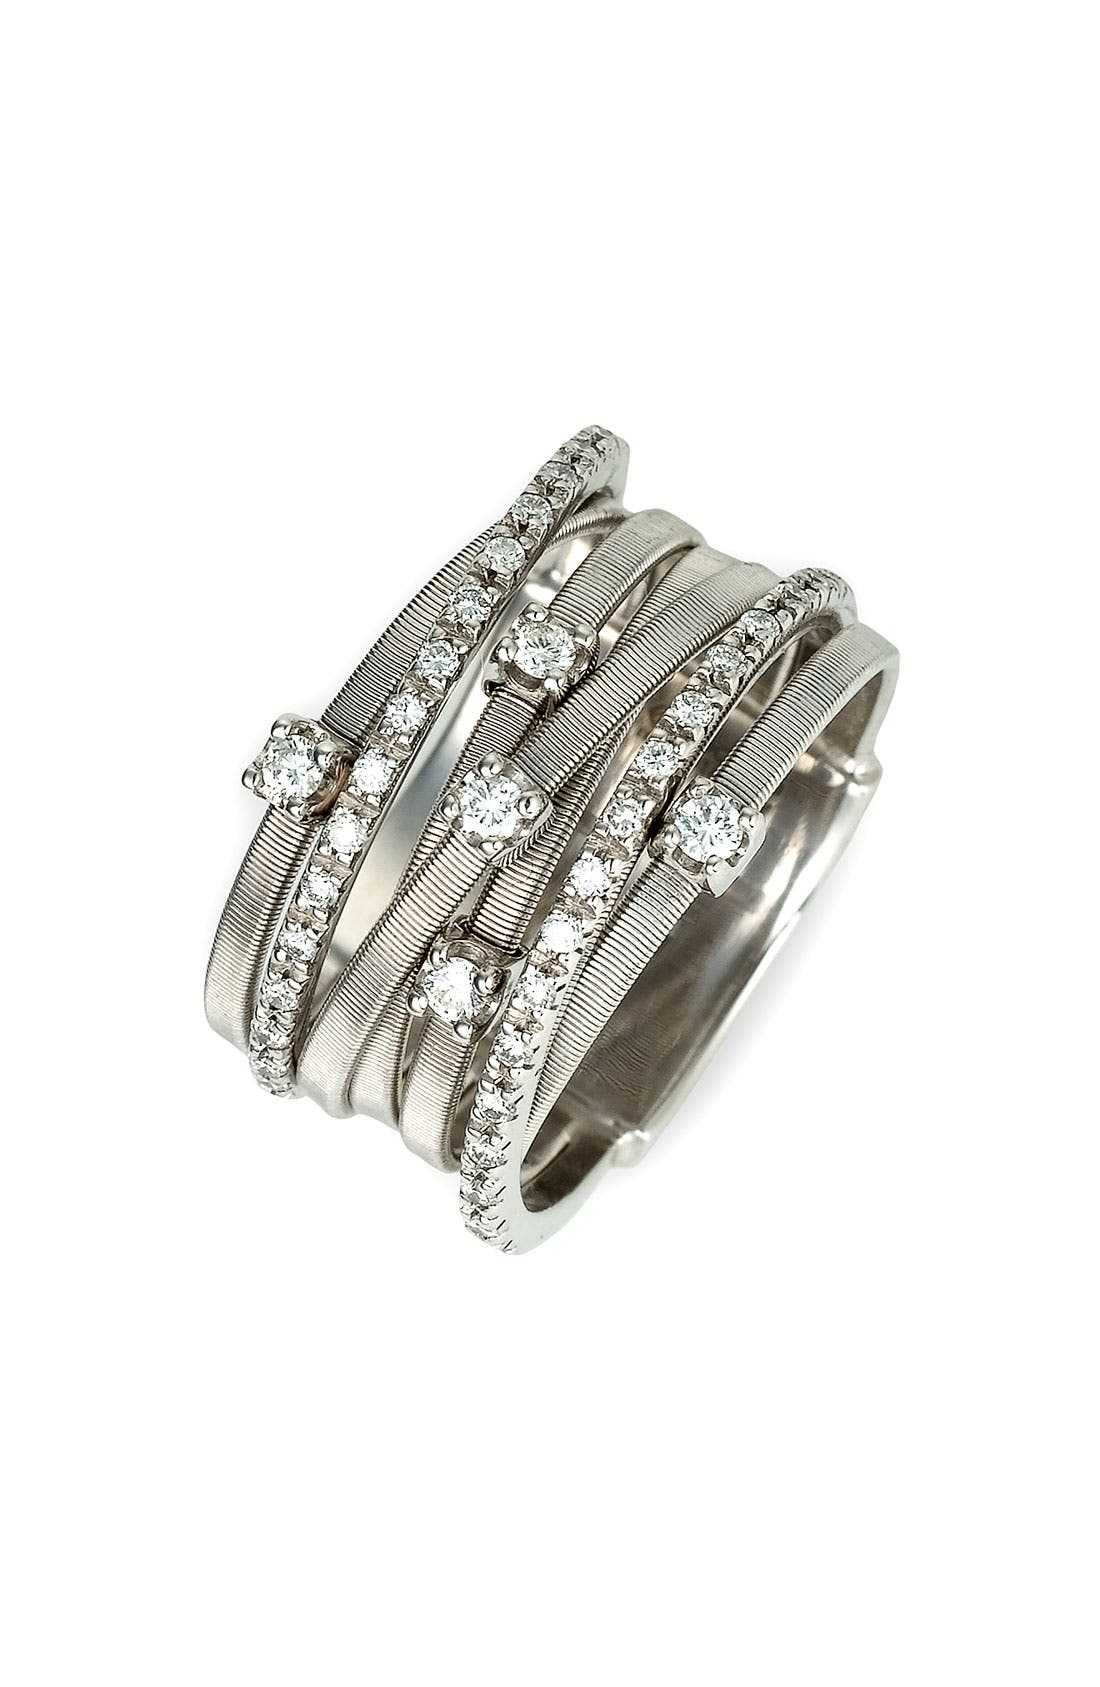 Main Image - Marco Bicego 'Goa' Seven Band Diamond Ring